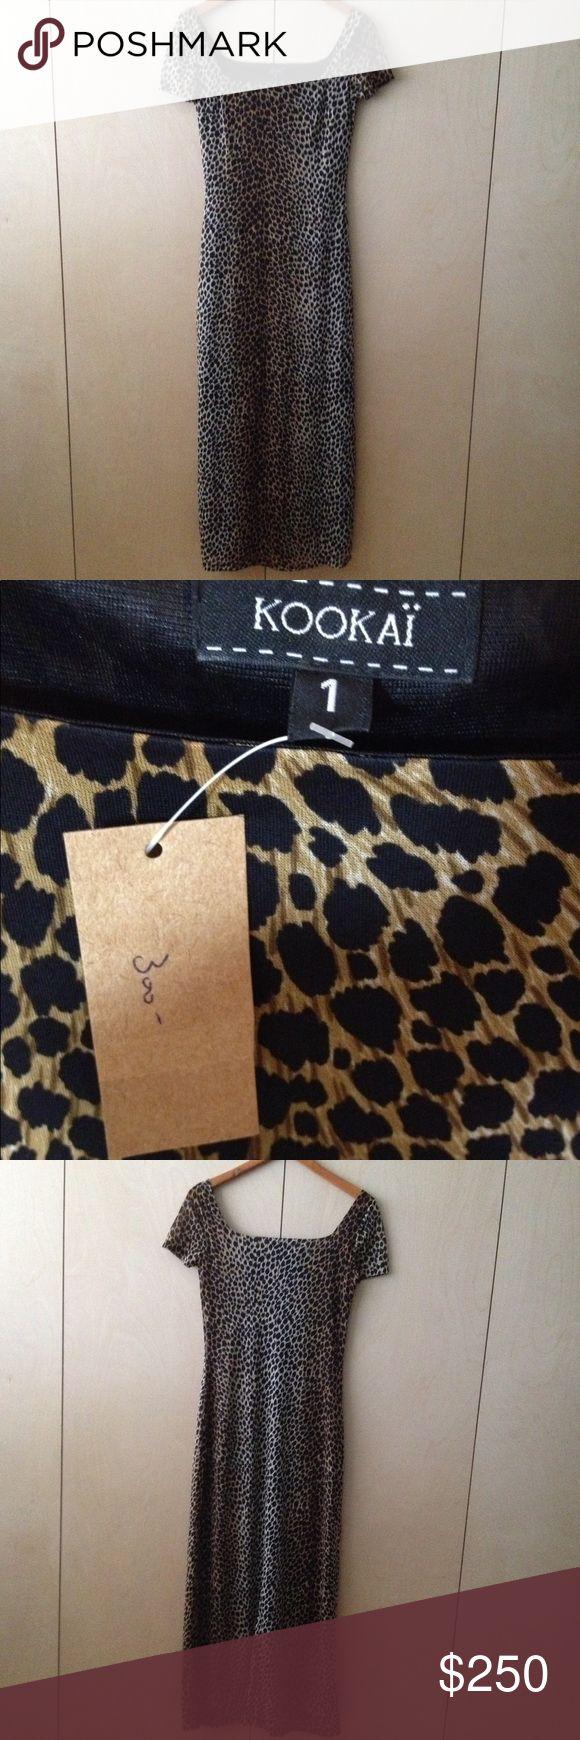 kookai leopard maxi dress long 1 or 34 animal NWT kookai leopard maxi dress long looks like it is marked size 1 or 34  but fits size 4 animal print. New with Tags. Kookai Dresses Maxi